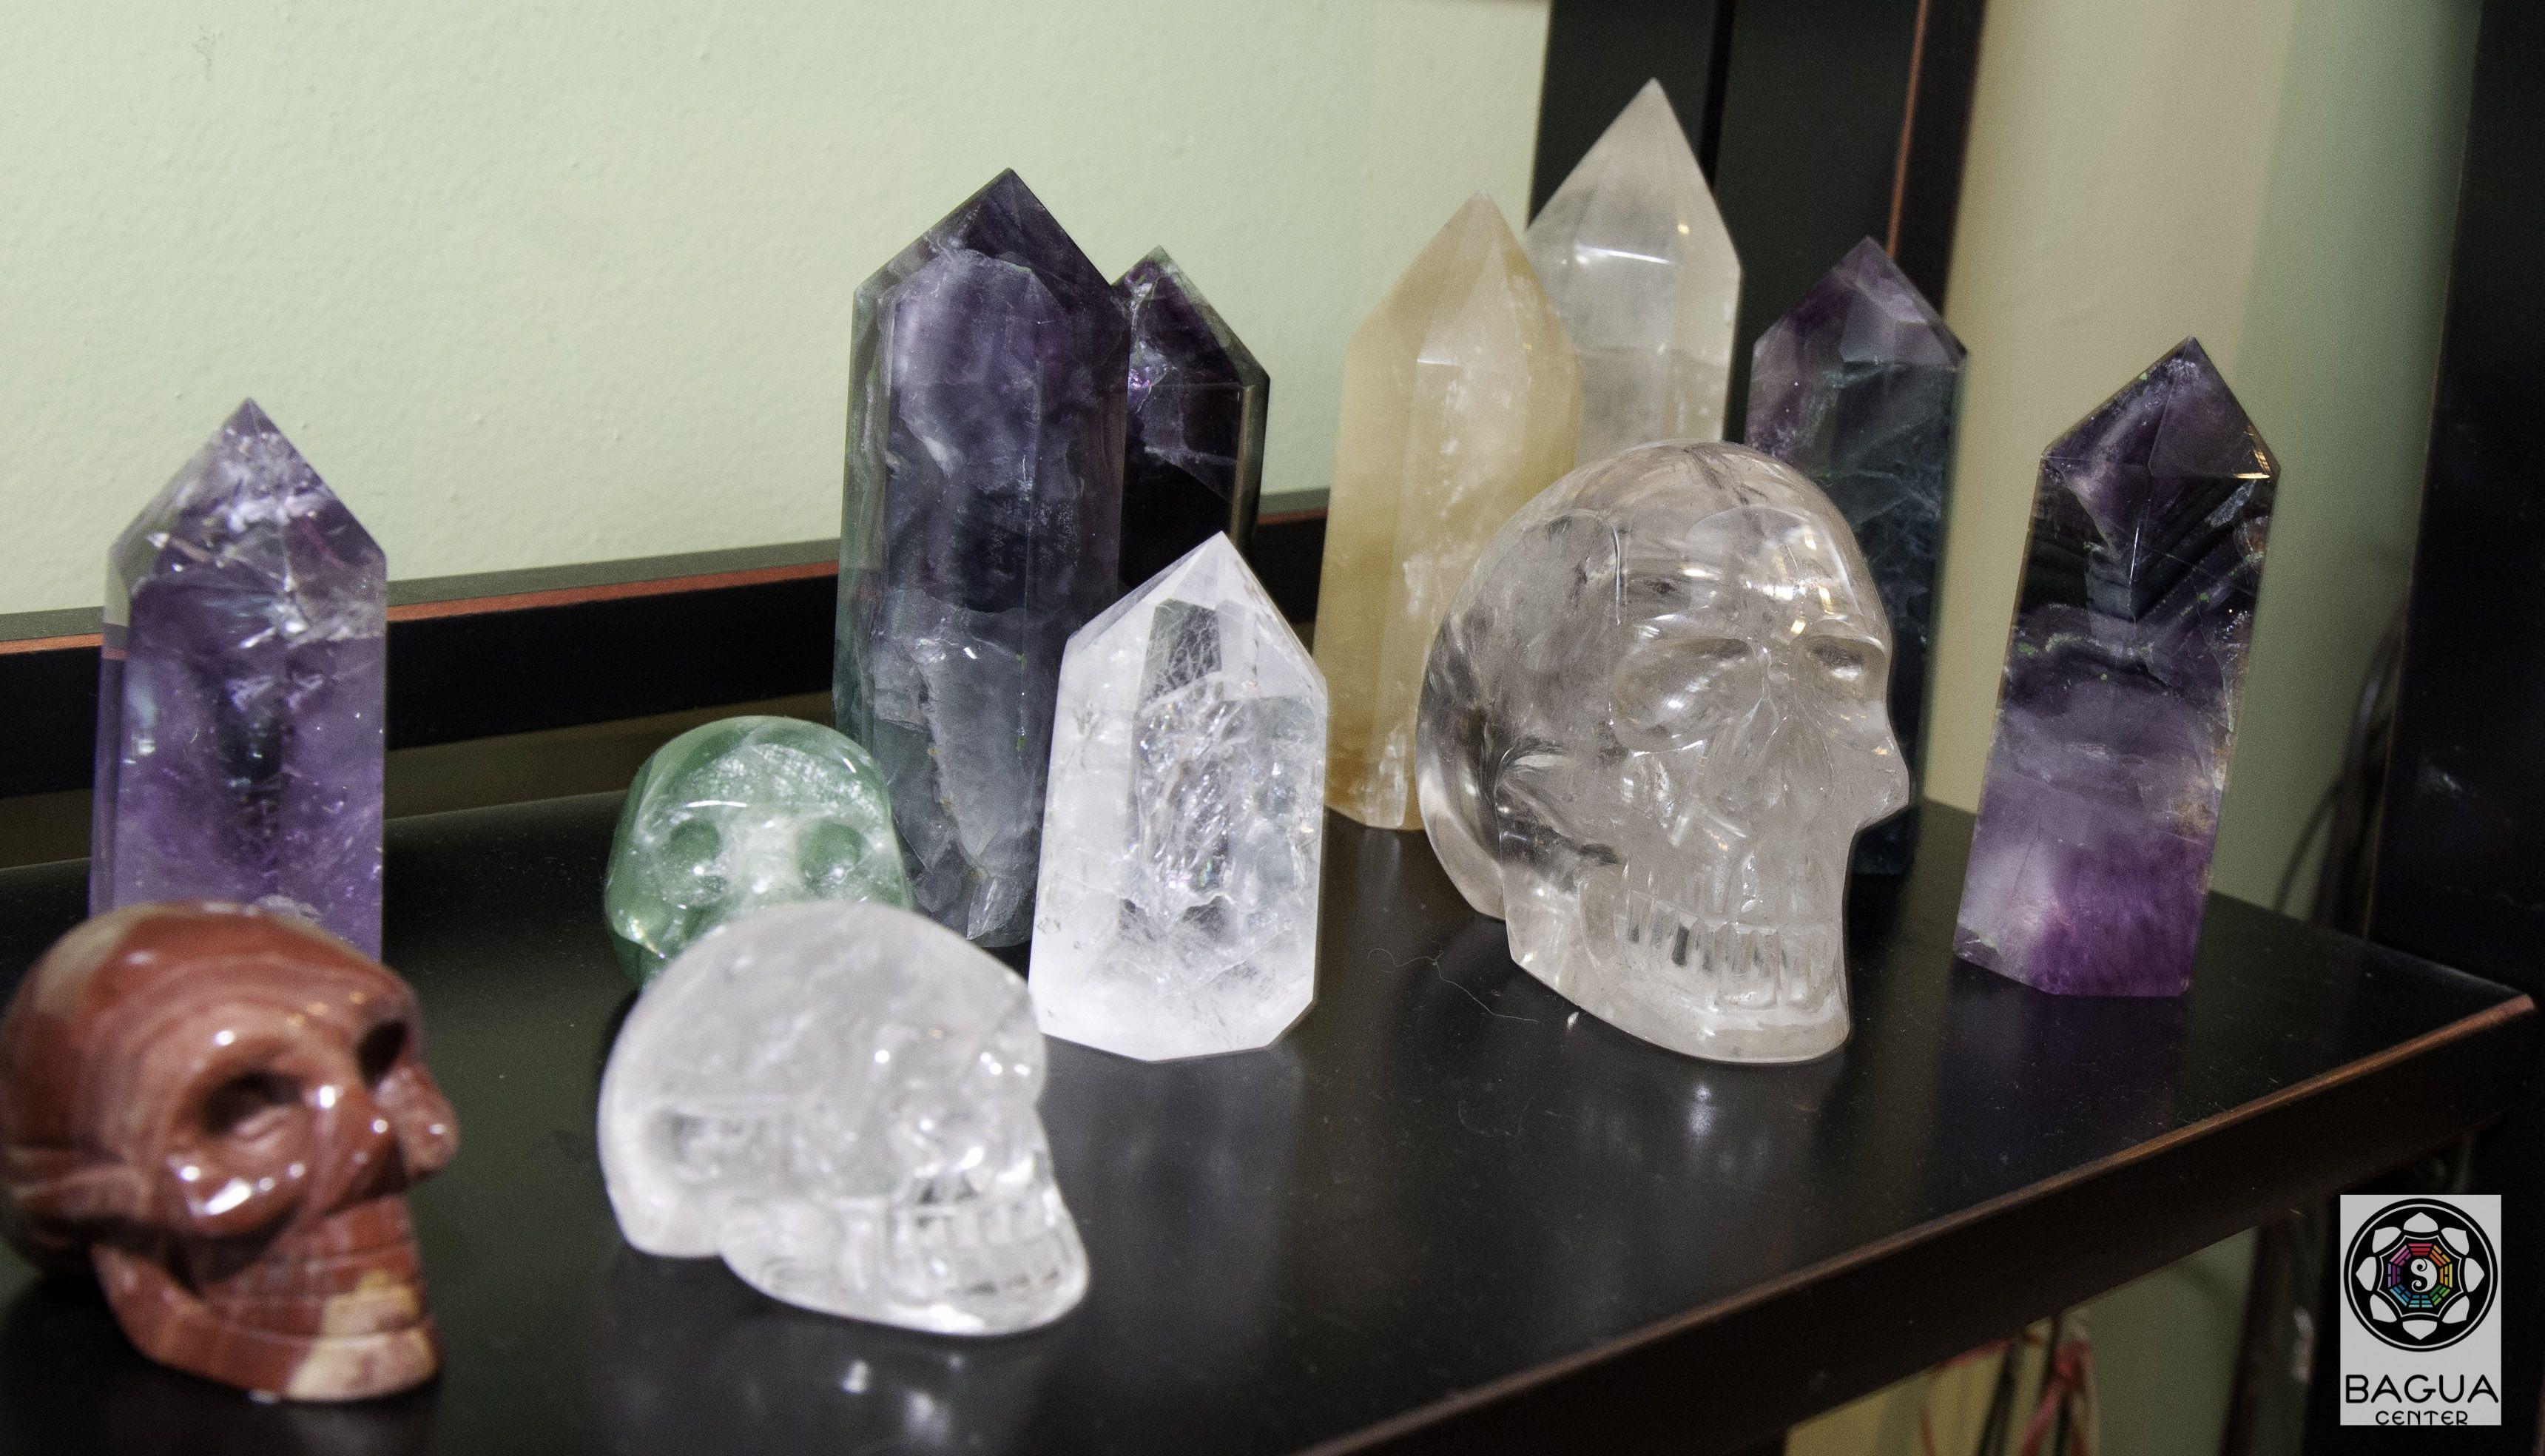 Crystals at Bagua Center